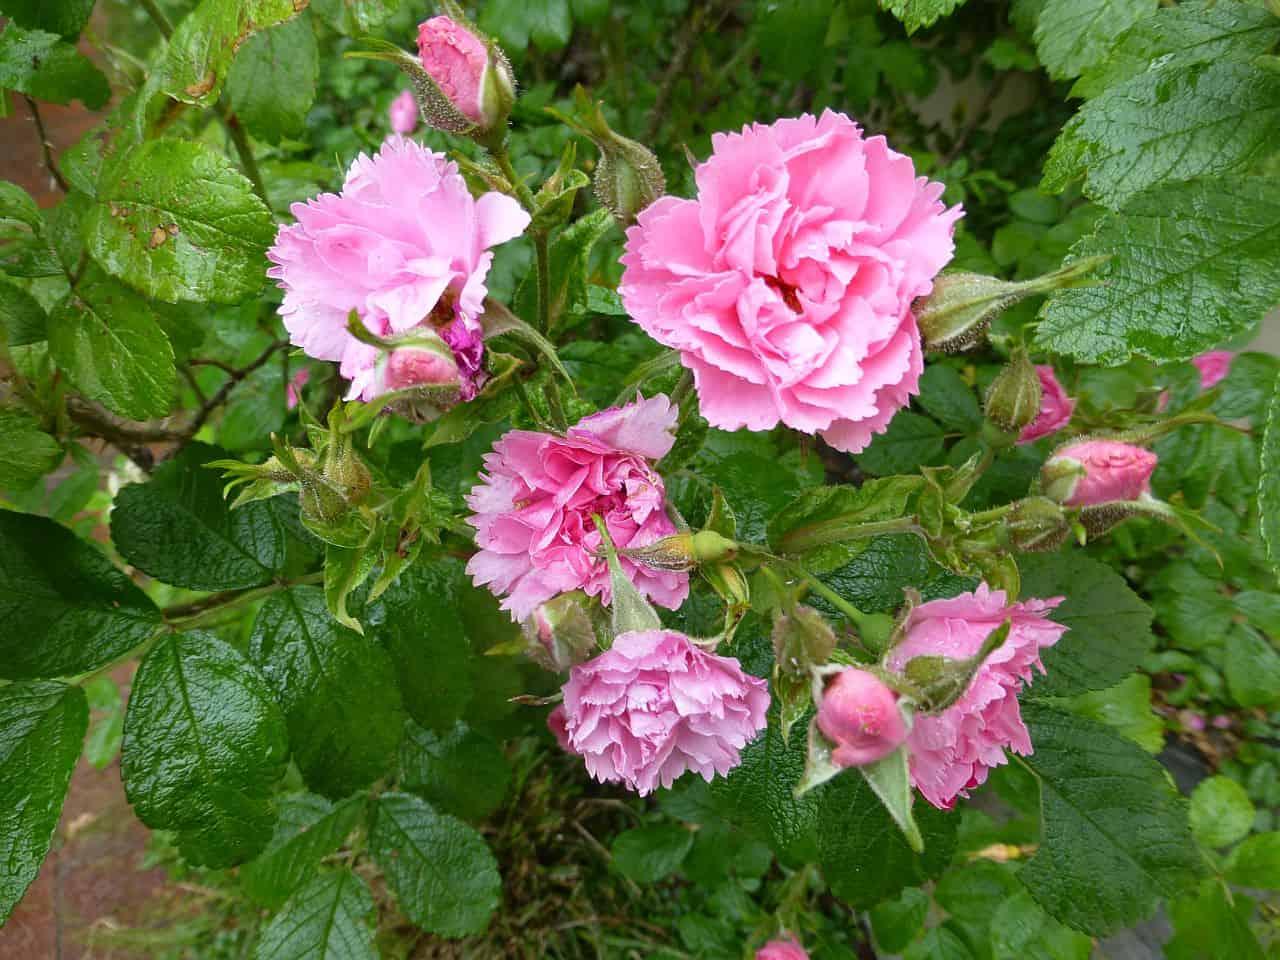 Rosa blühende Wildrose